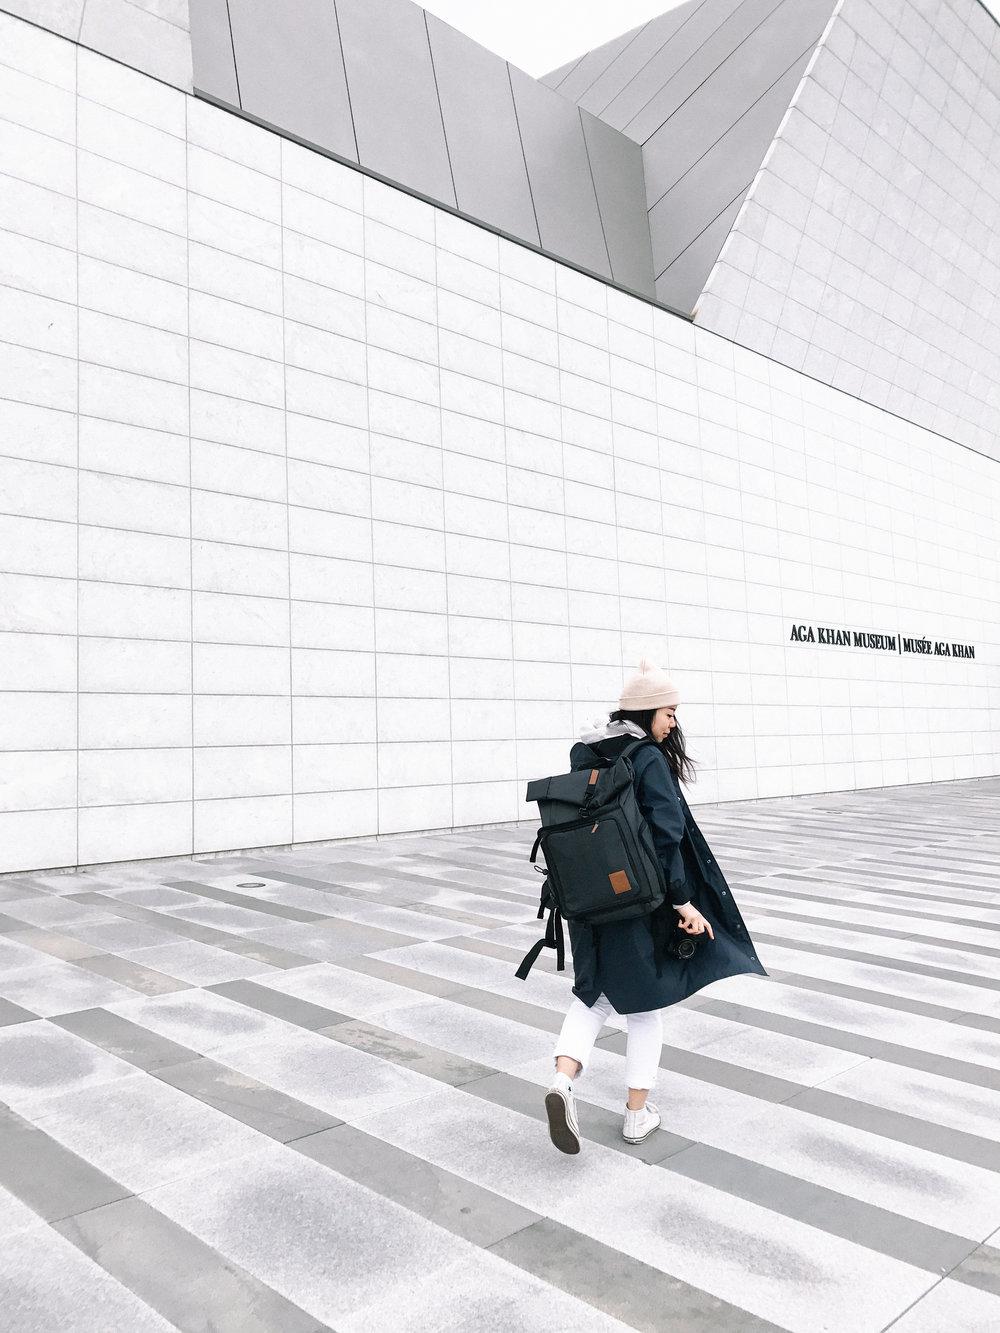 Nicole Cheng at Aga Khan Brevite by a social media photographer